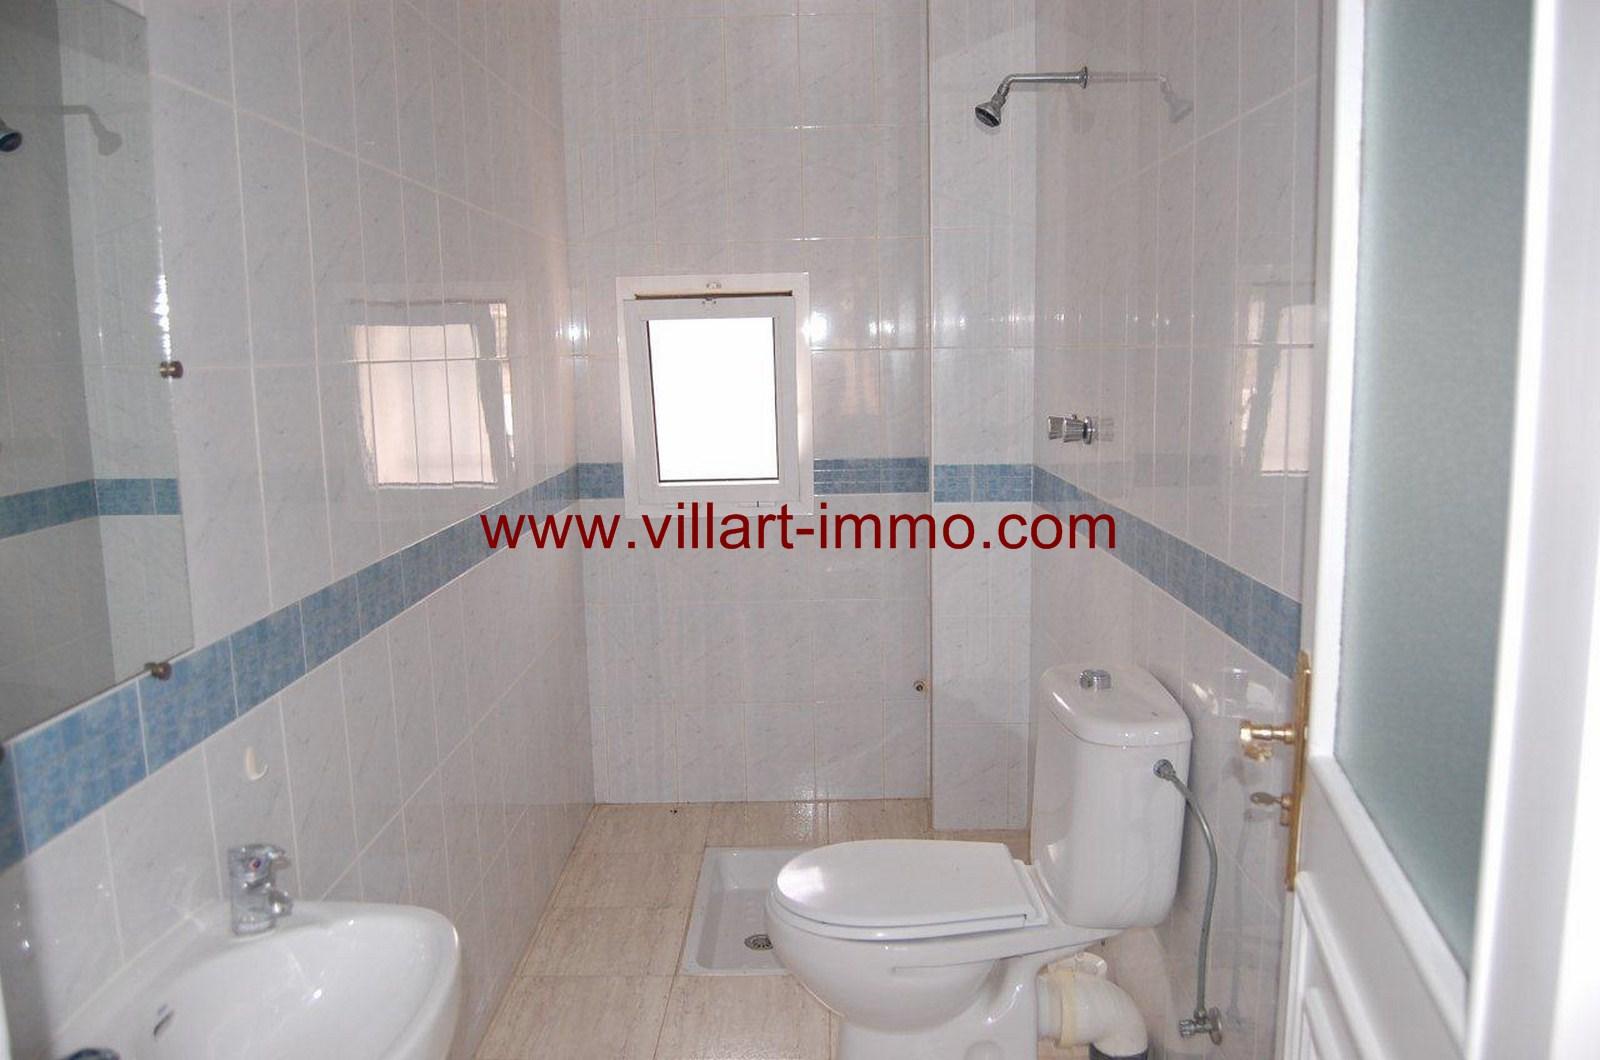 12-vente-villa-tanger-malabata-salle-de-bain-2-va362-villart-immo